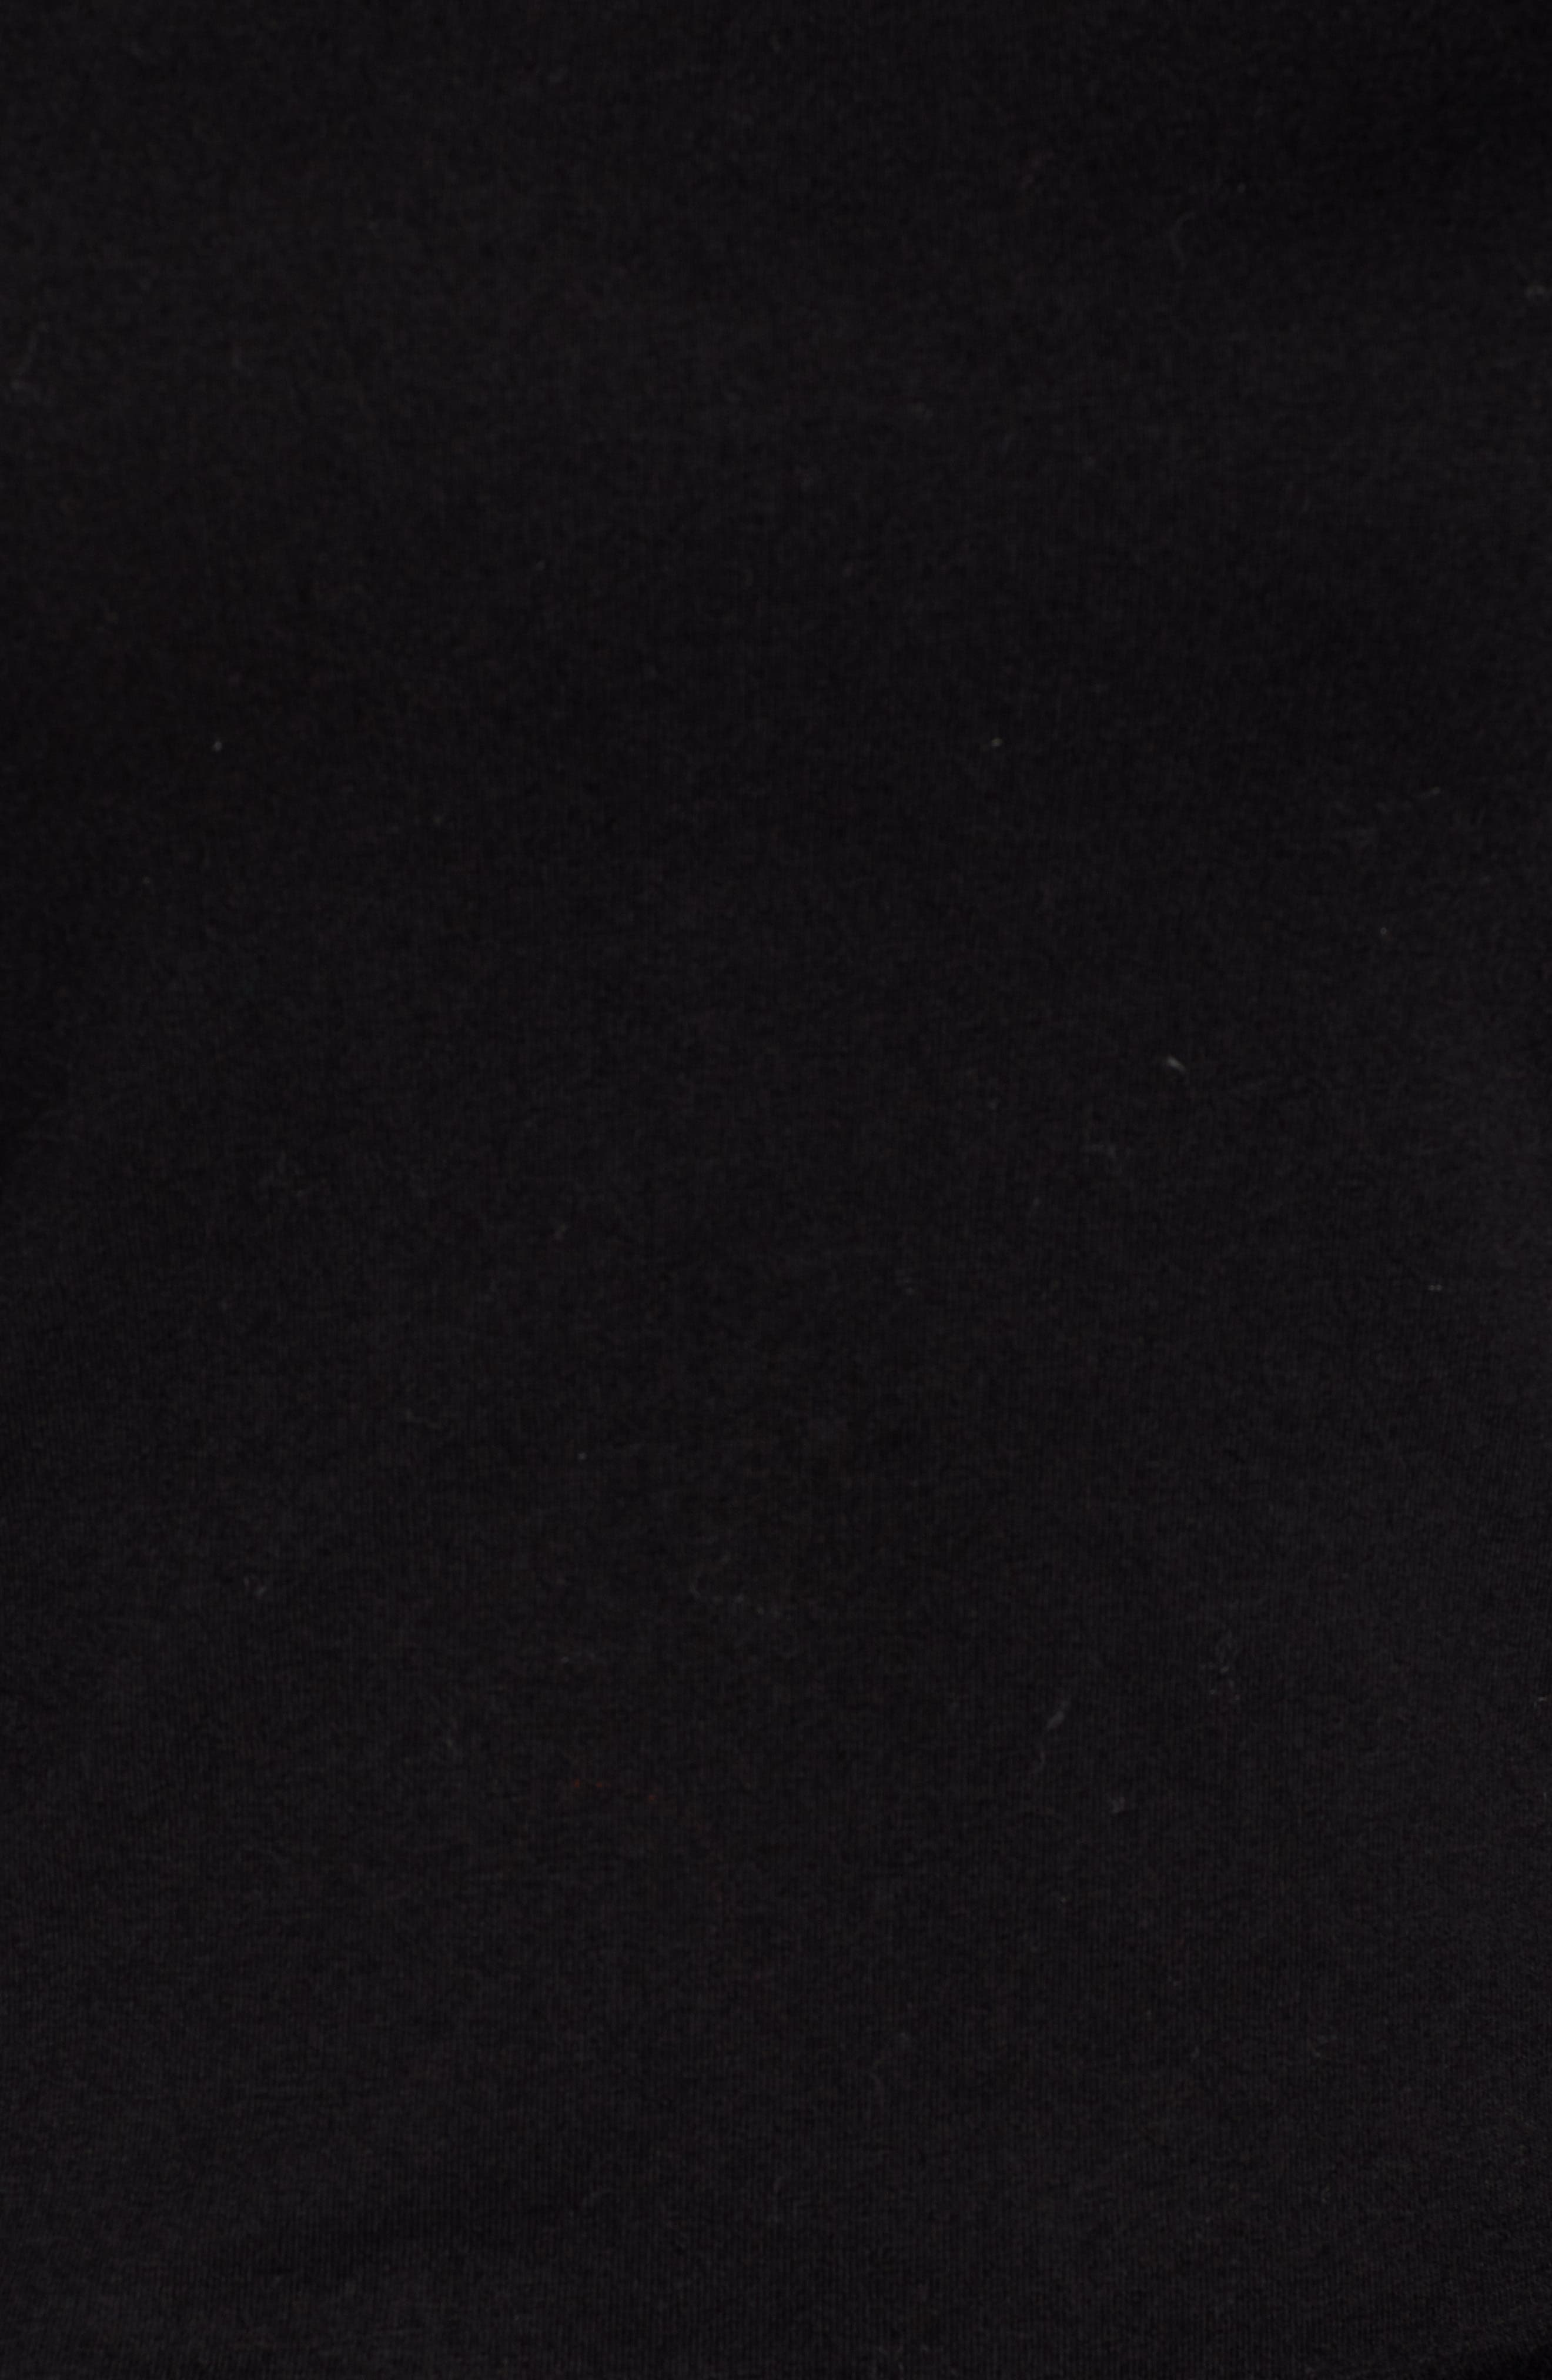 Bow Back Stretch Cotton Blend Turtleneck Top,                             Alternate thumbnail 5, color,                             001